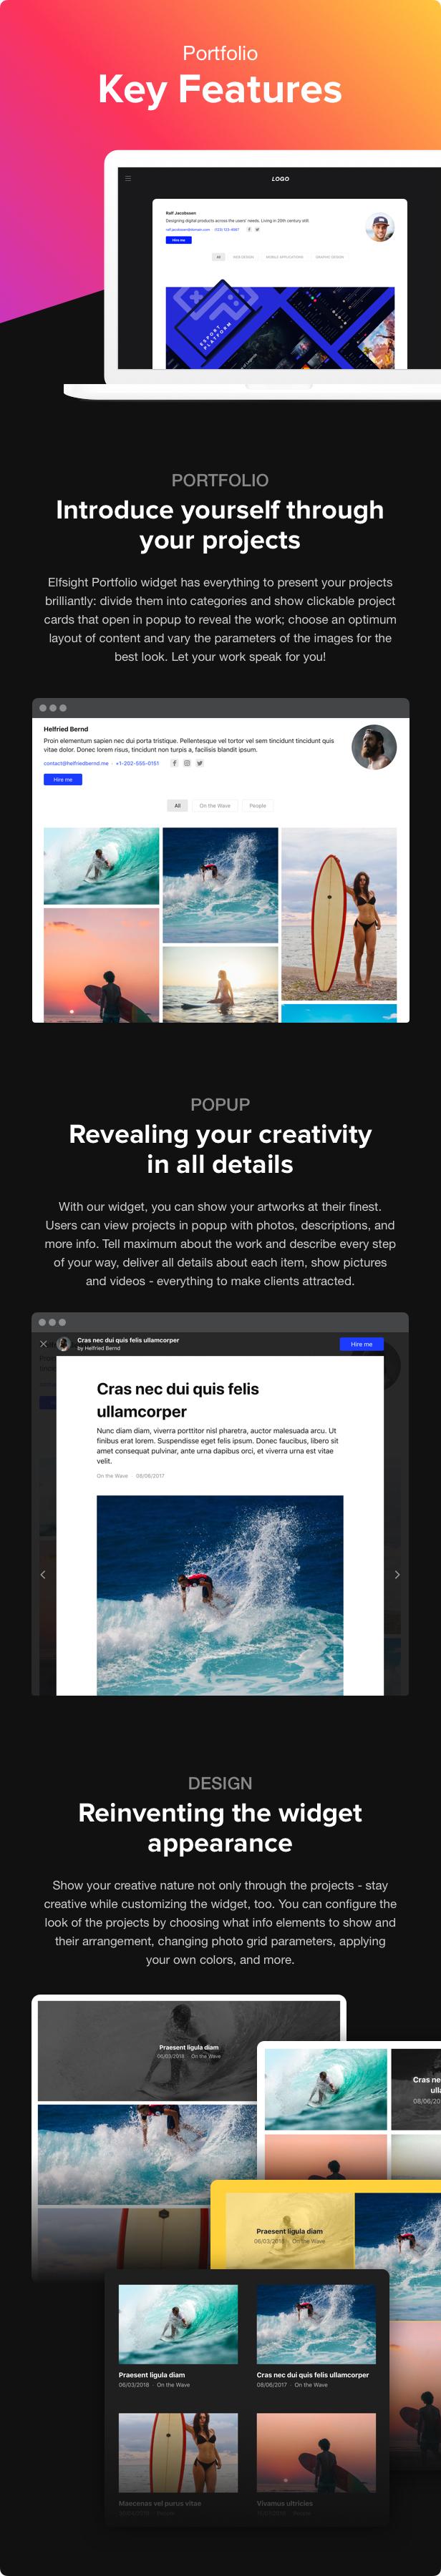 Portfolio Gallery - WordPress Portfolio Plugin - 2